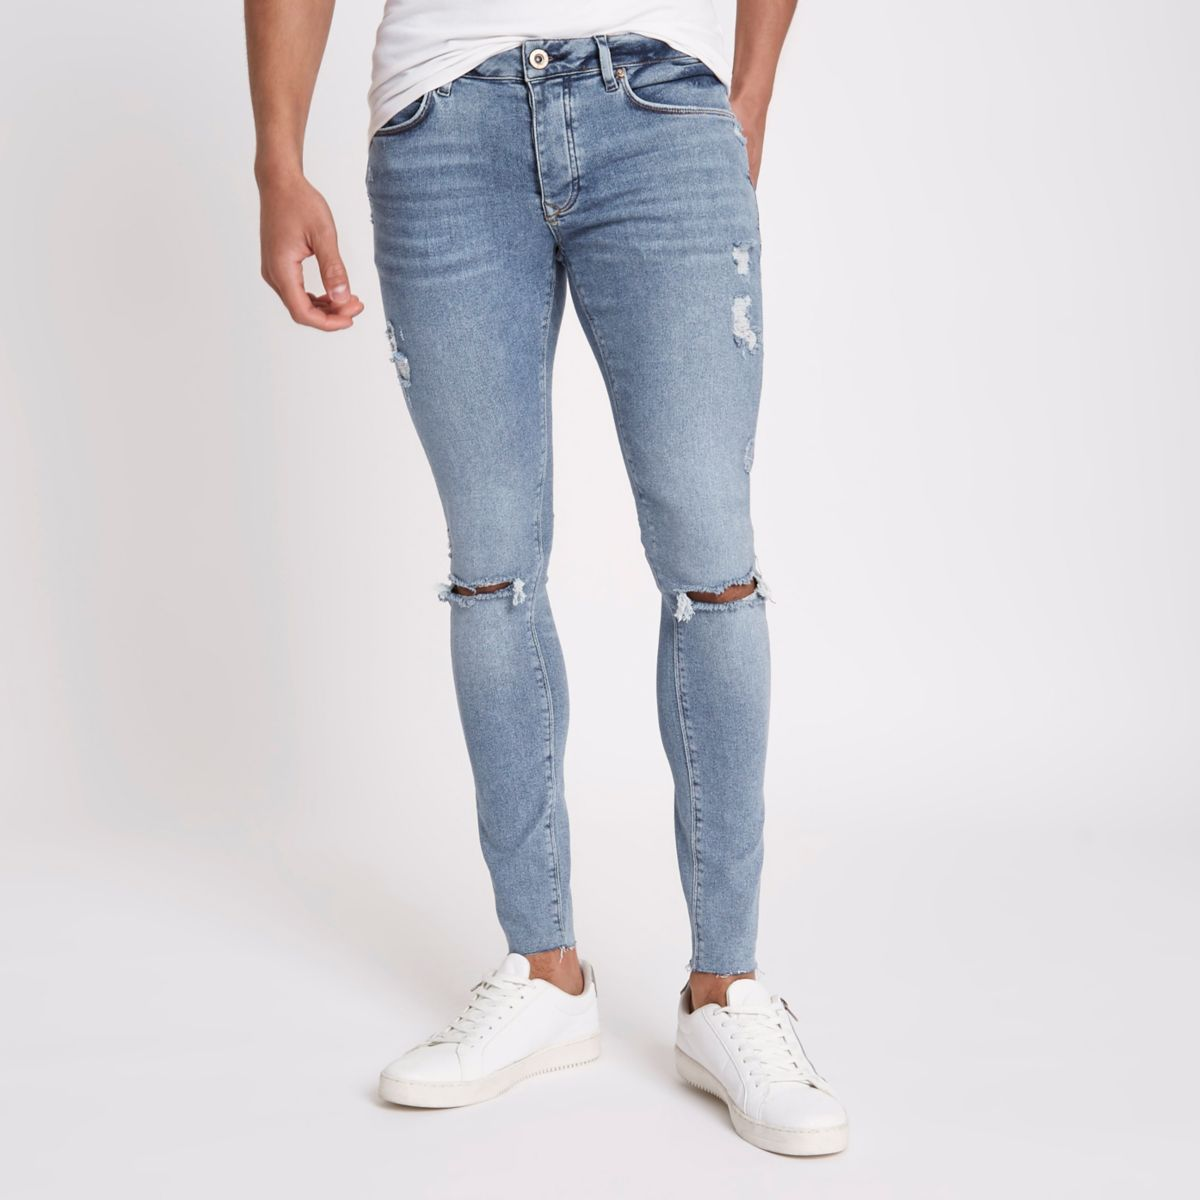 Danny - Jean super skinny bleu moyen à zips aux chevillesRiver Island 0HgMdSf